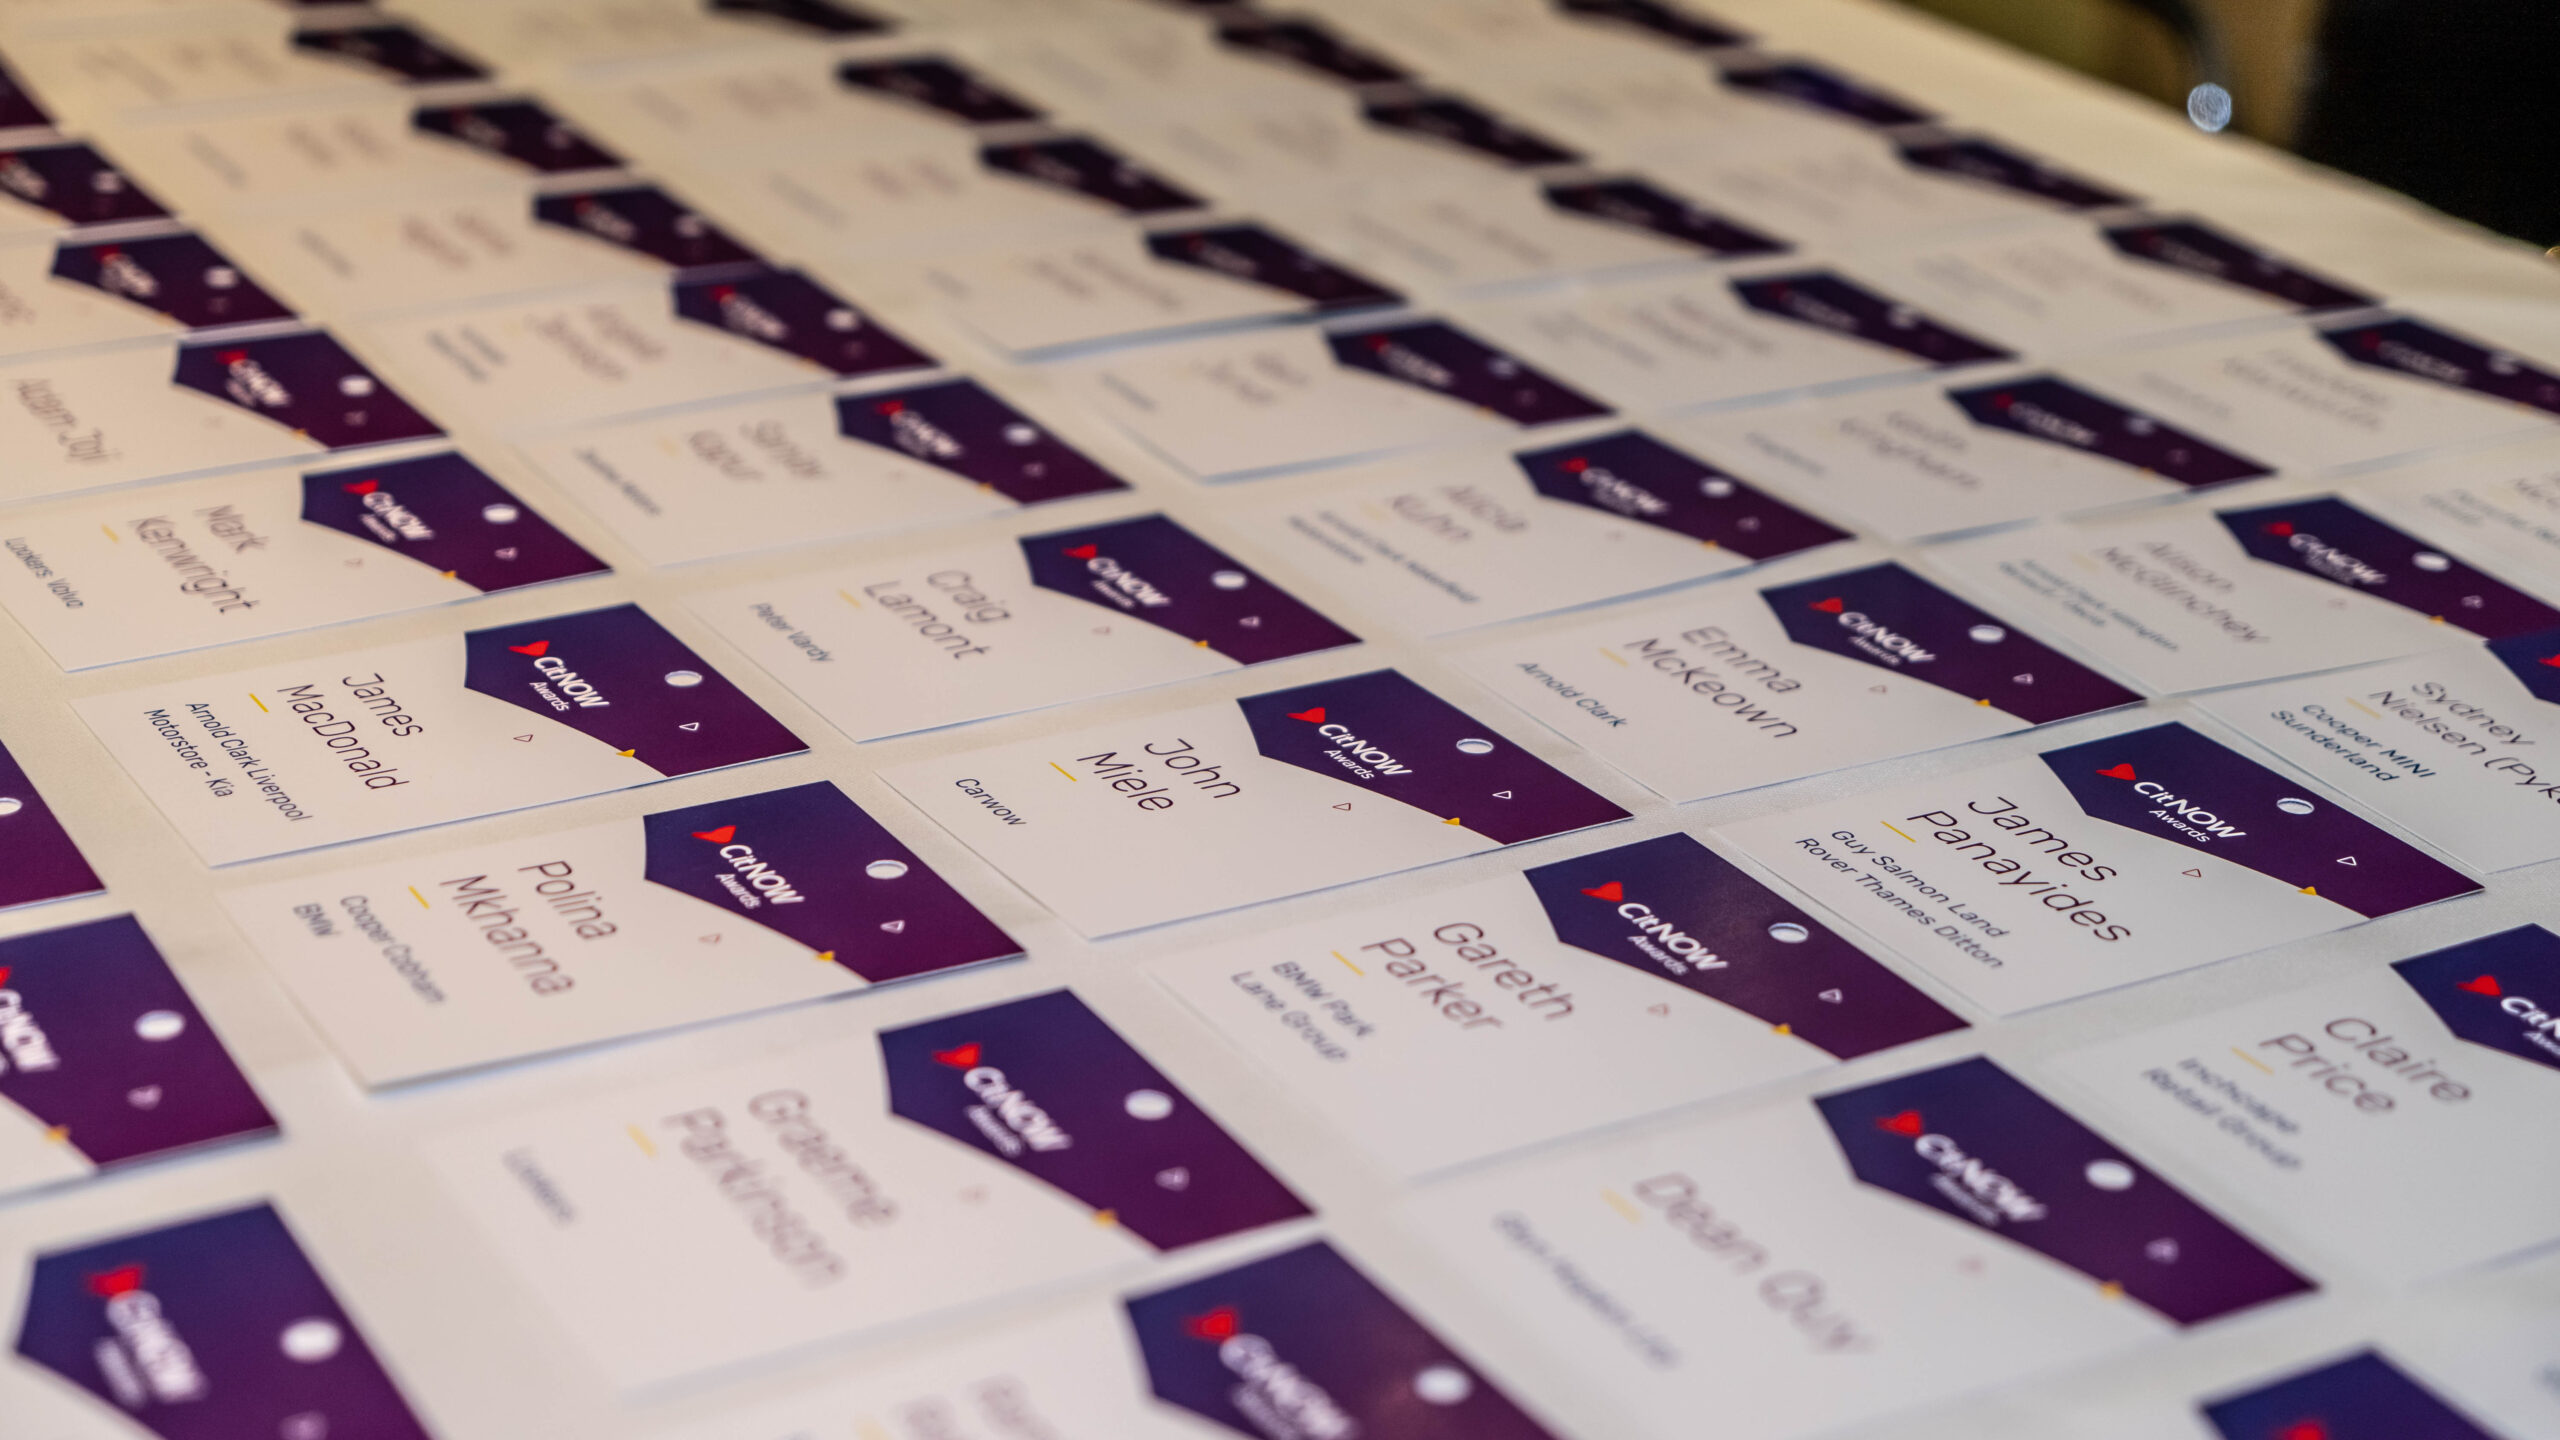 CitNOW Awards Name Tags